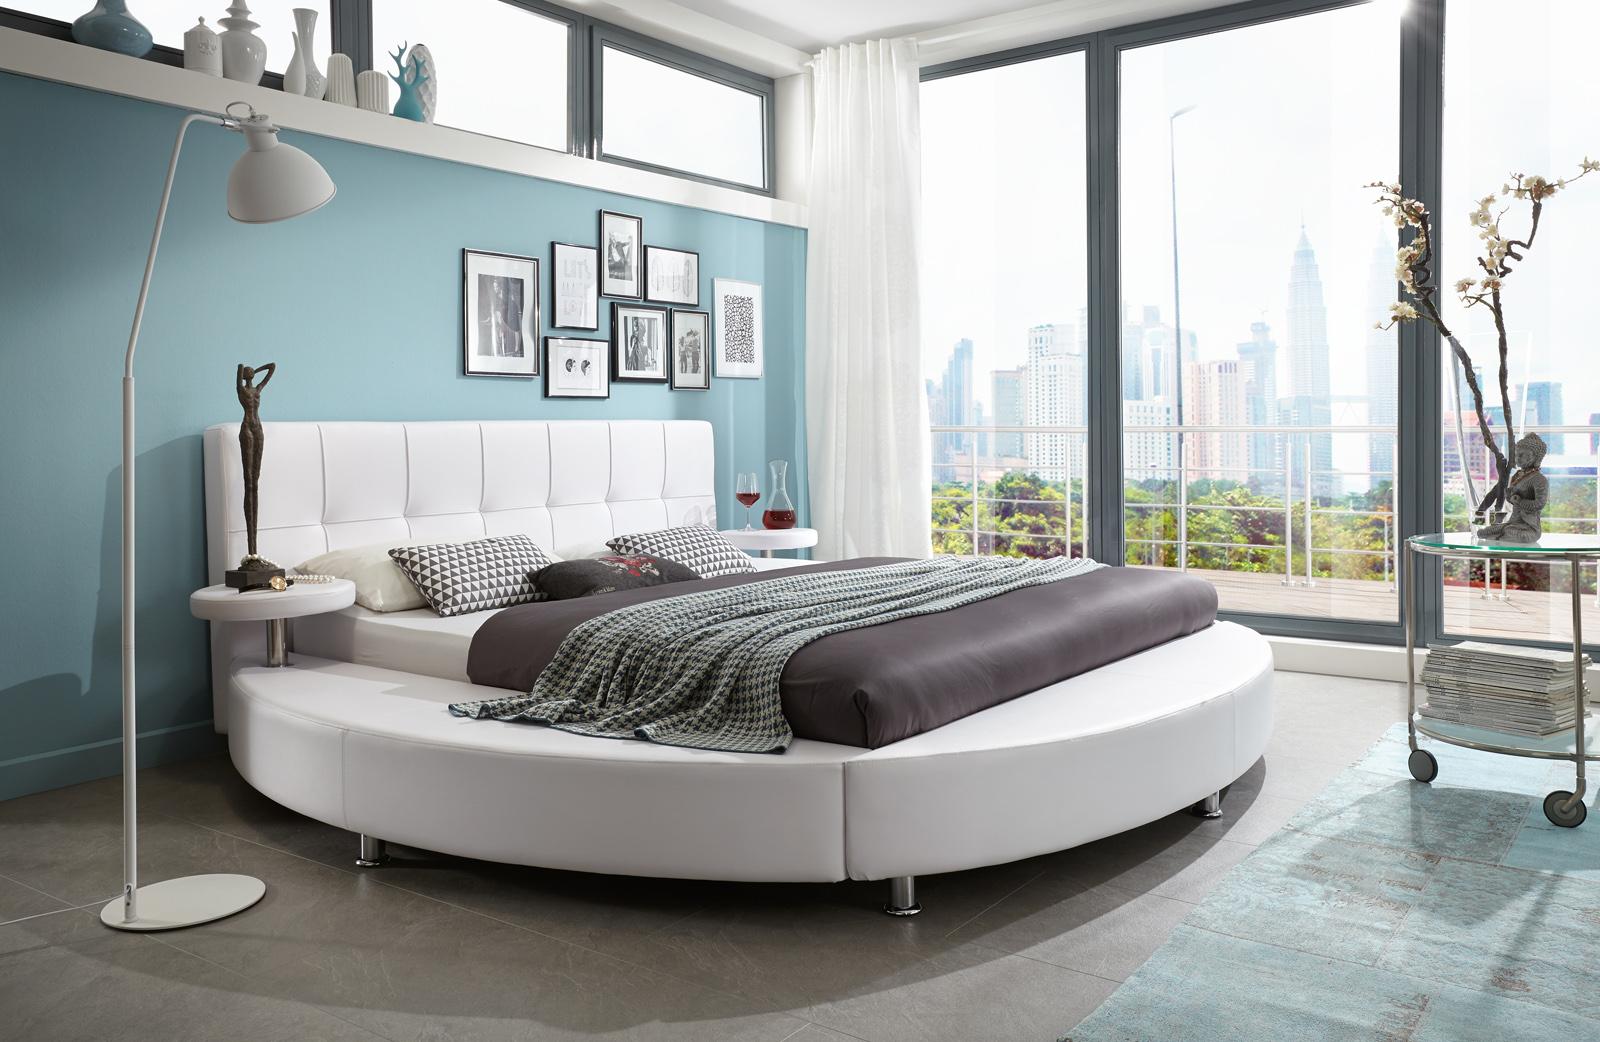 sam g nstiges rundbett 200 cm x 200 cm wei zarah demn chst. Black Bedroom Furniture Sets. Home Design Ideas